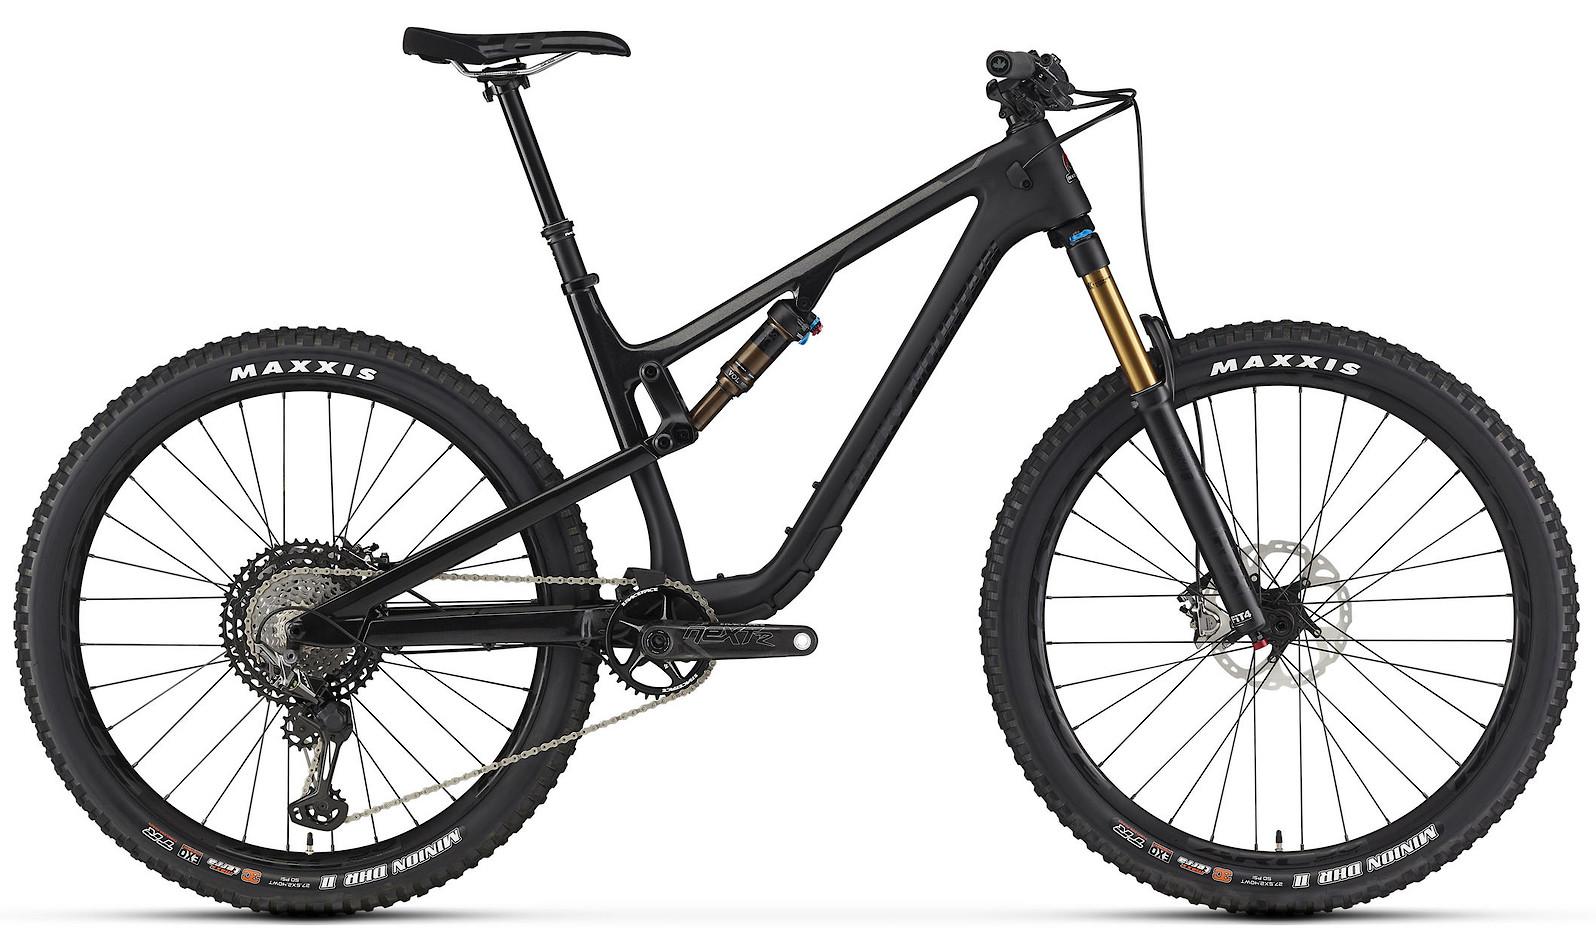 2020 Rocky Mountain Thunderbolt Carbon 90 Black and Black